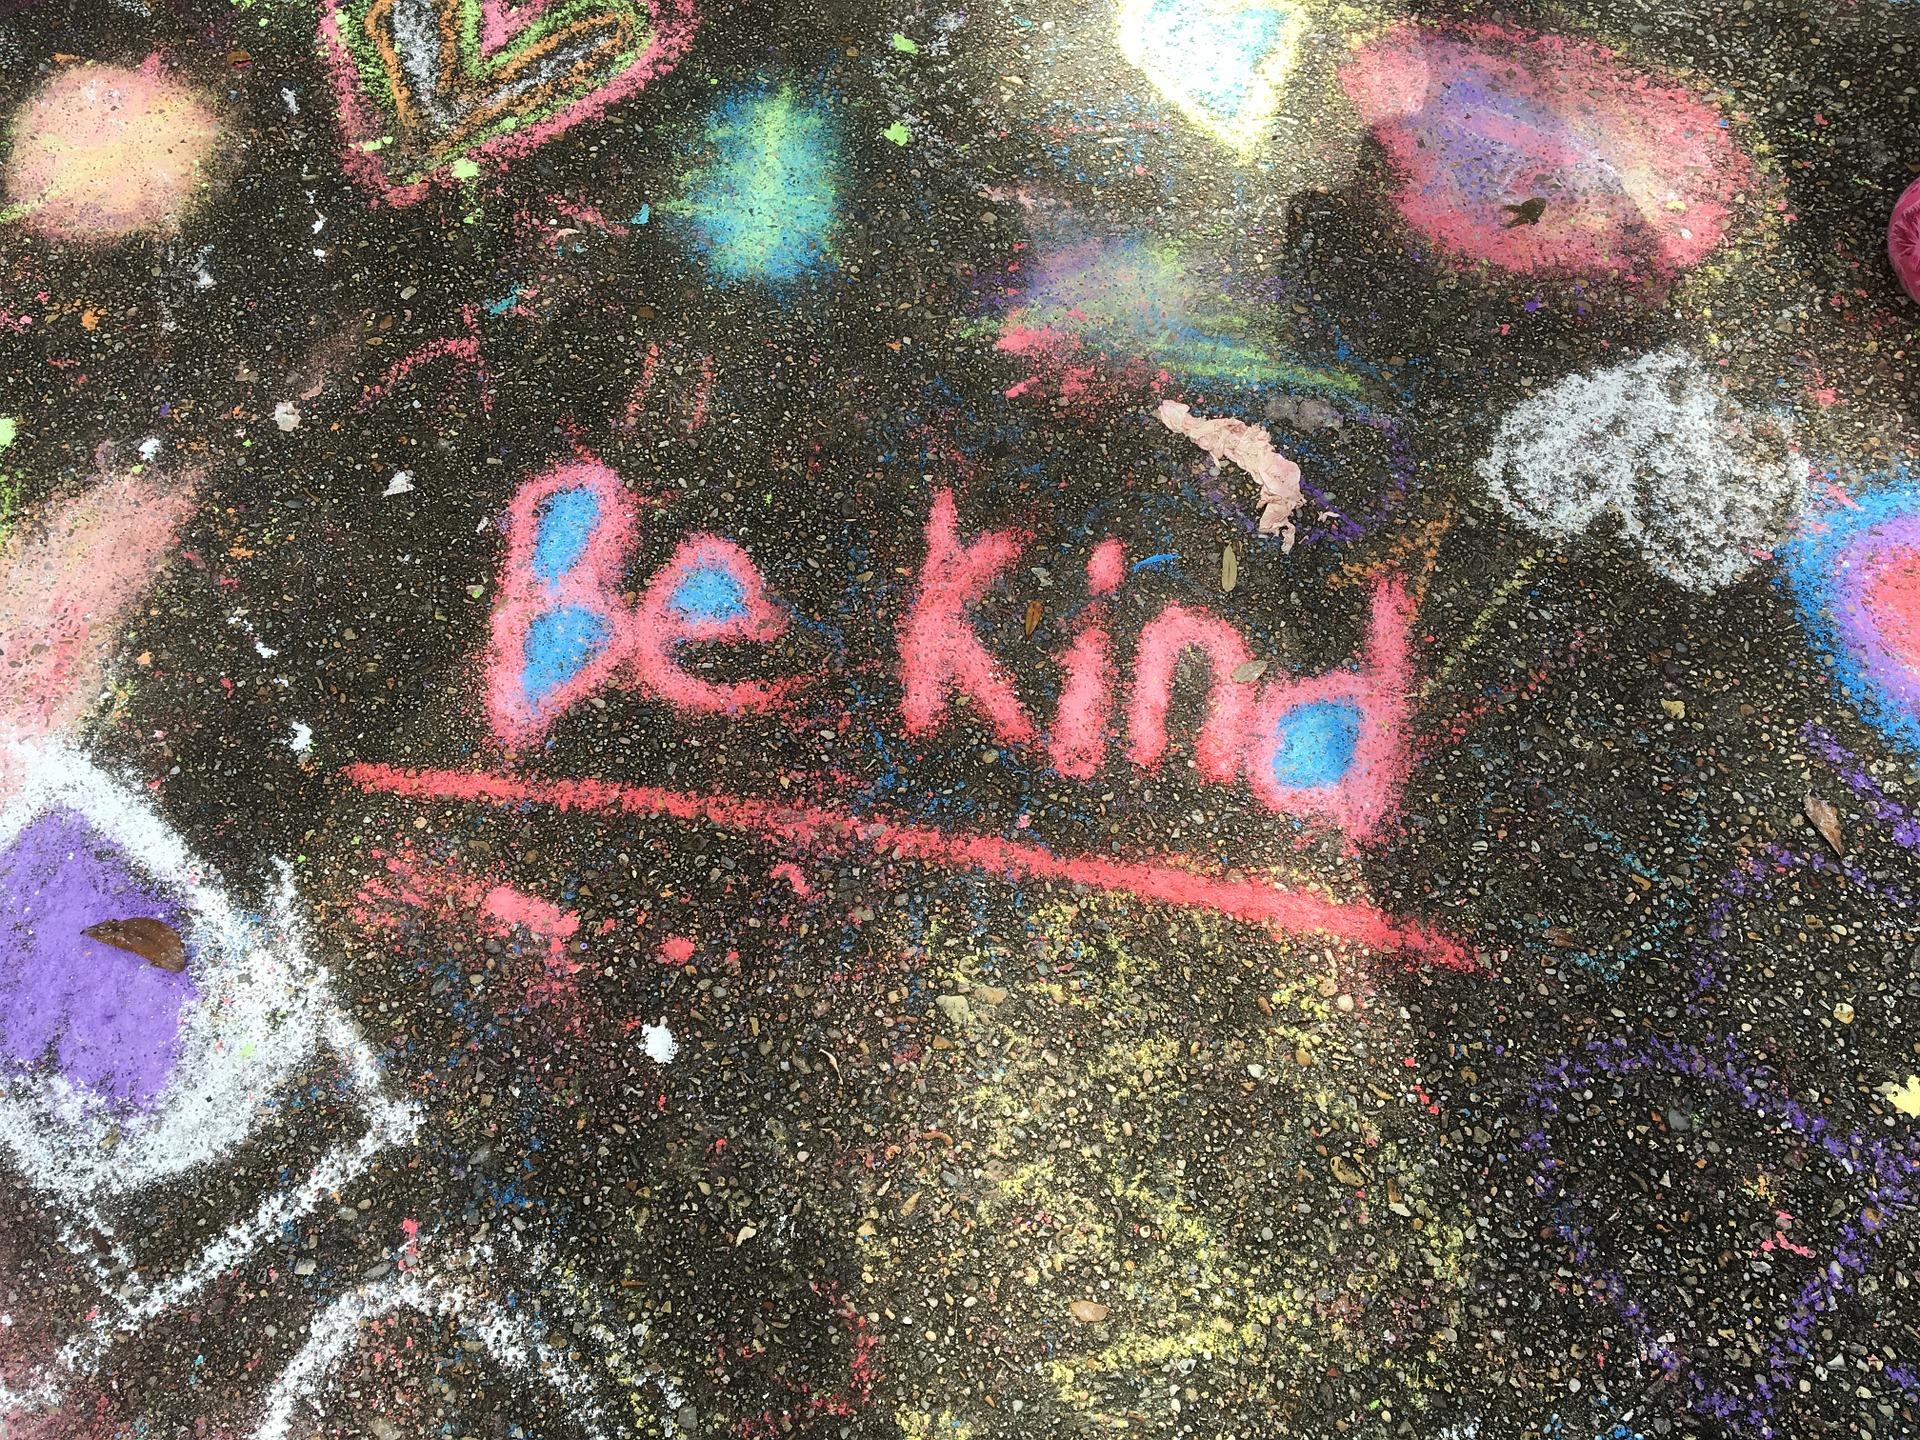 kindness-1197351_1920.jpg